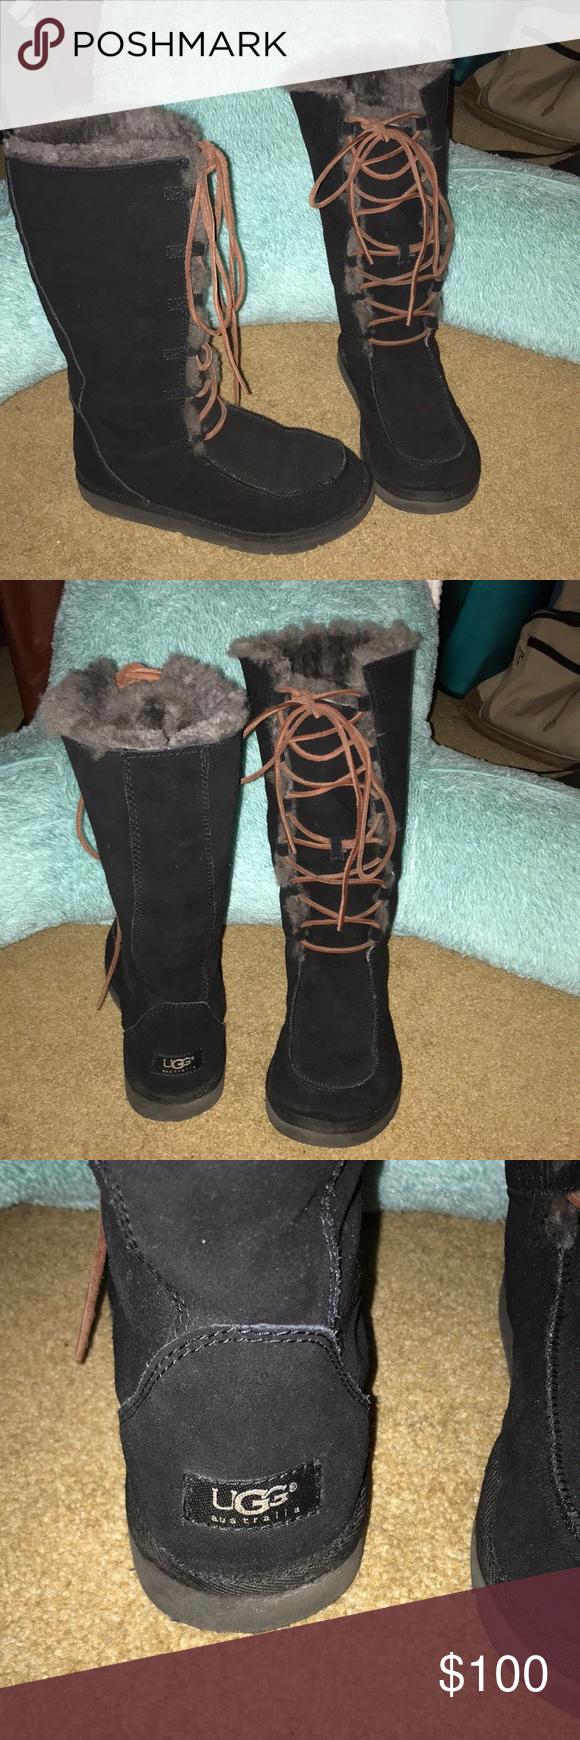 363d47c420a UGG Australia Tall Black Lace up Winter Boots Ugg Australia Tall ...